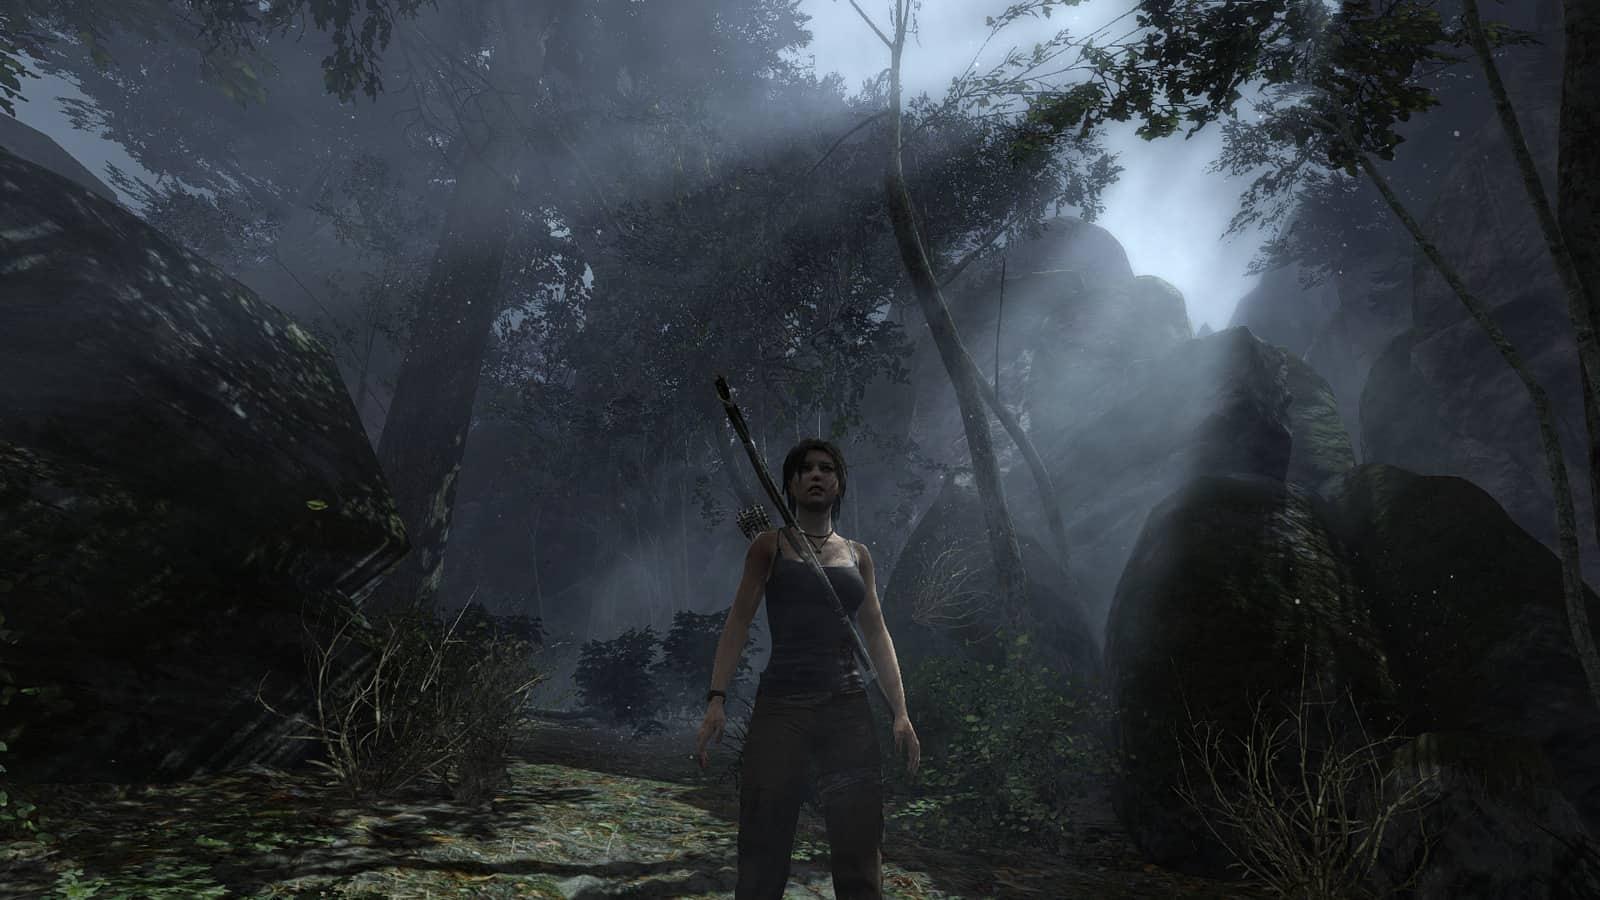 """Tomb Raider""(CC BY 2.0)byJBLivin"